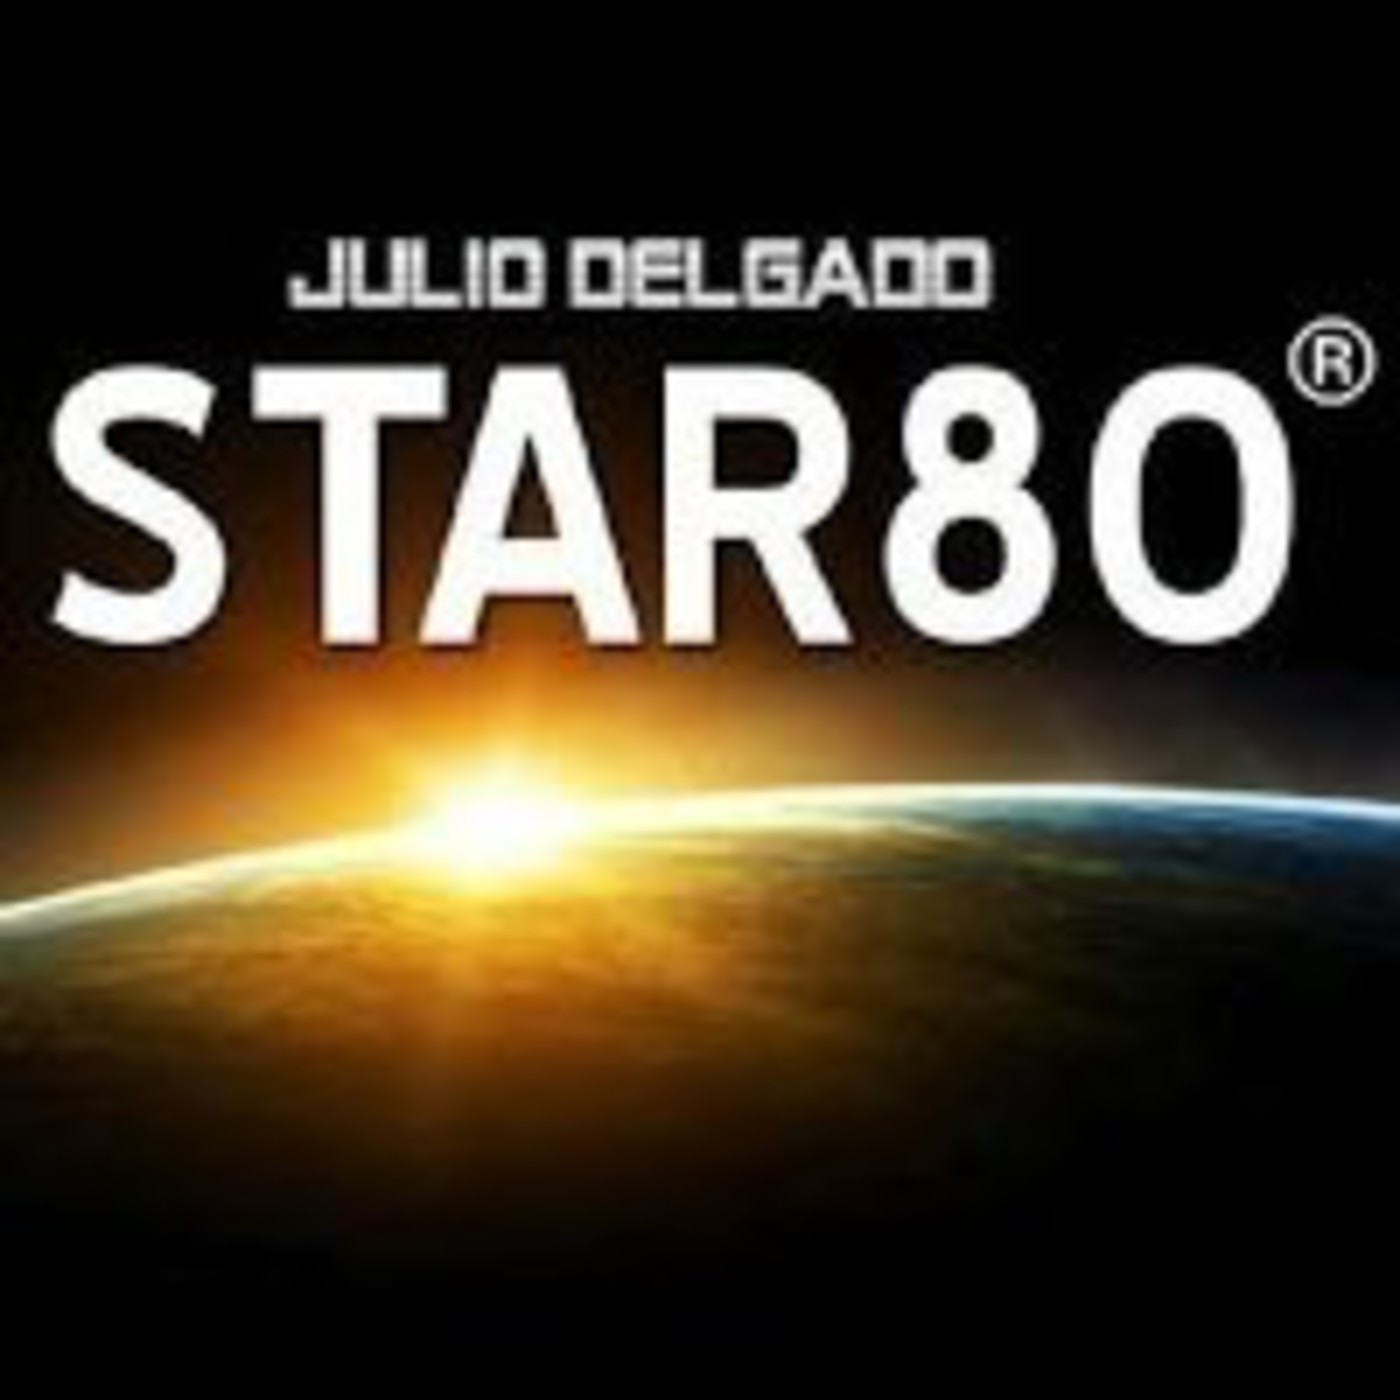 <![CDATA[Podcast Star 80]]>